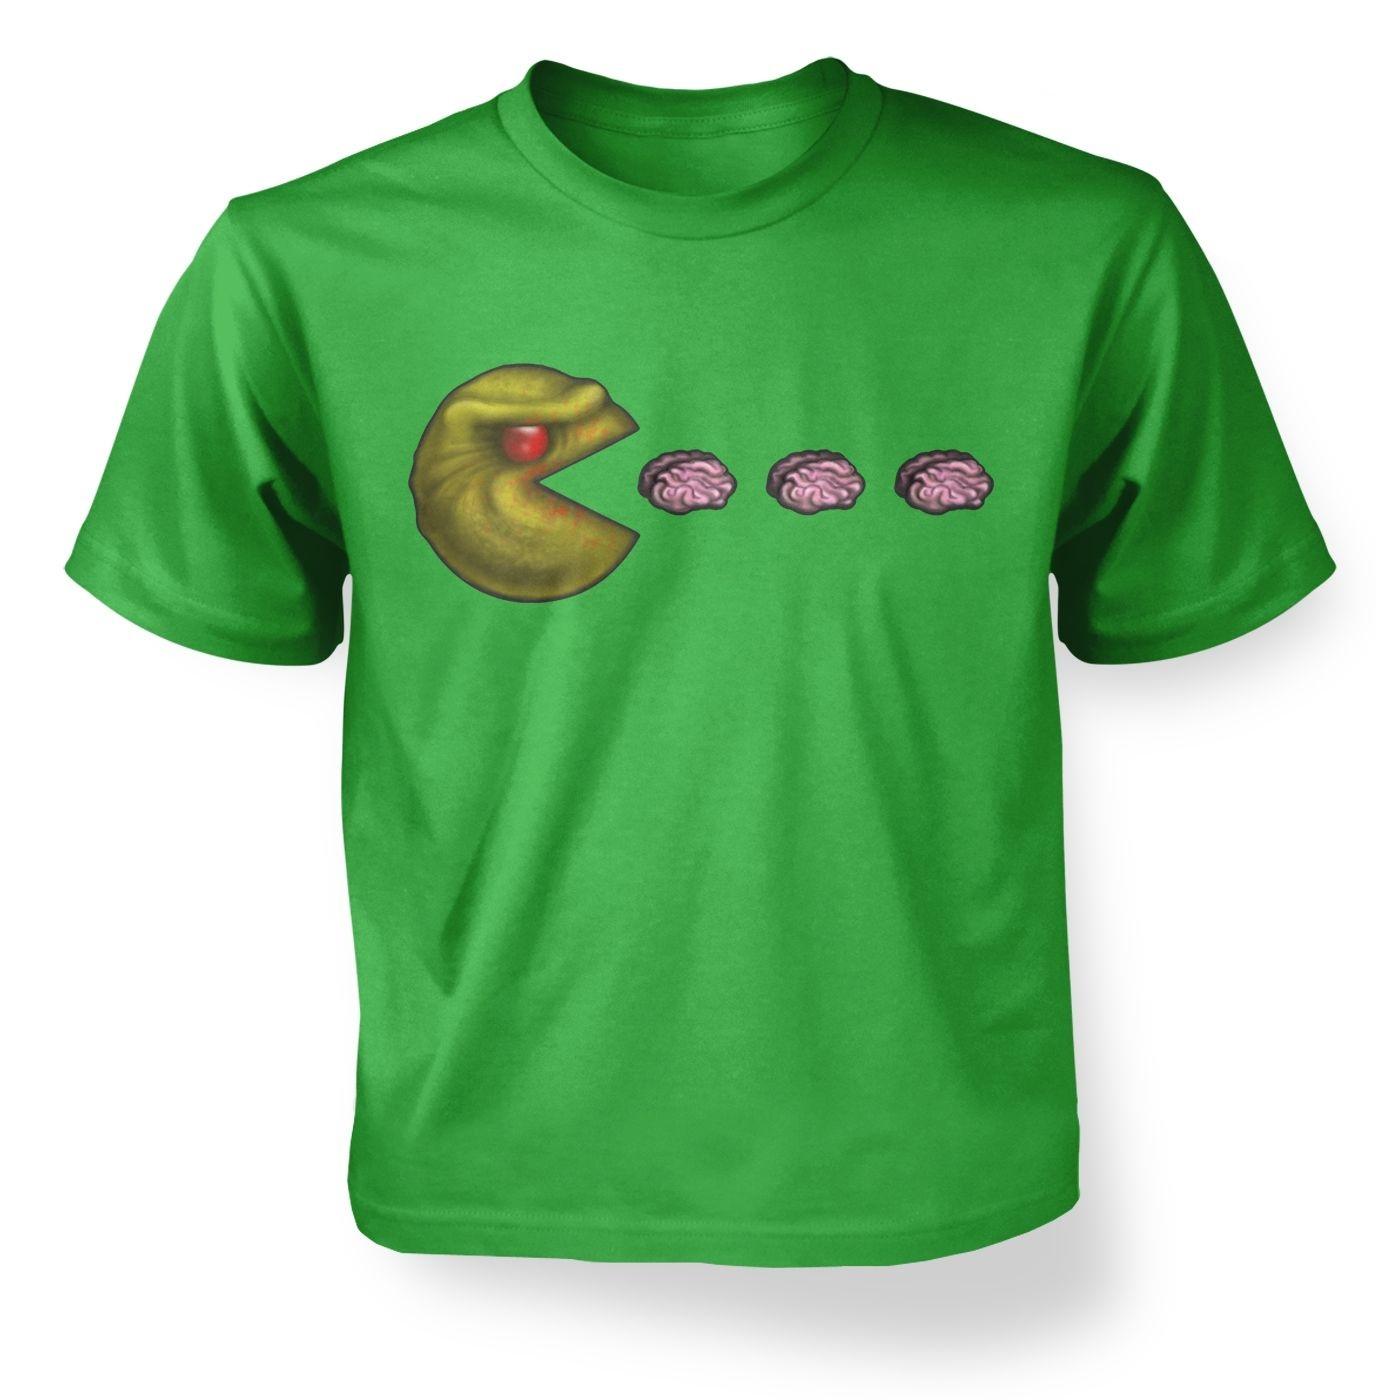 Zombie Pacman Kid's t-shirt